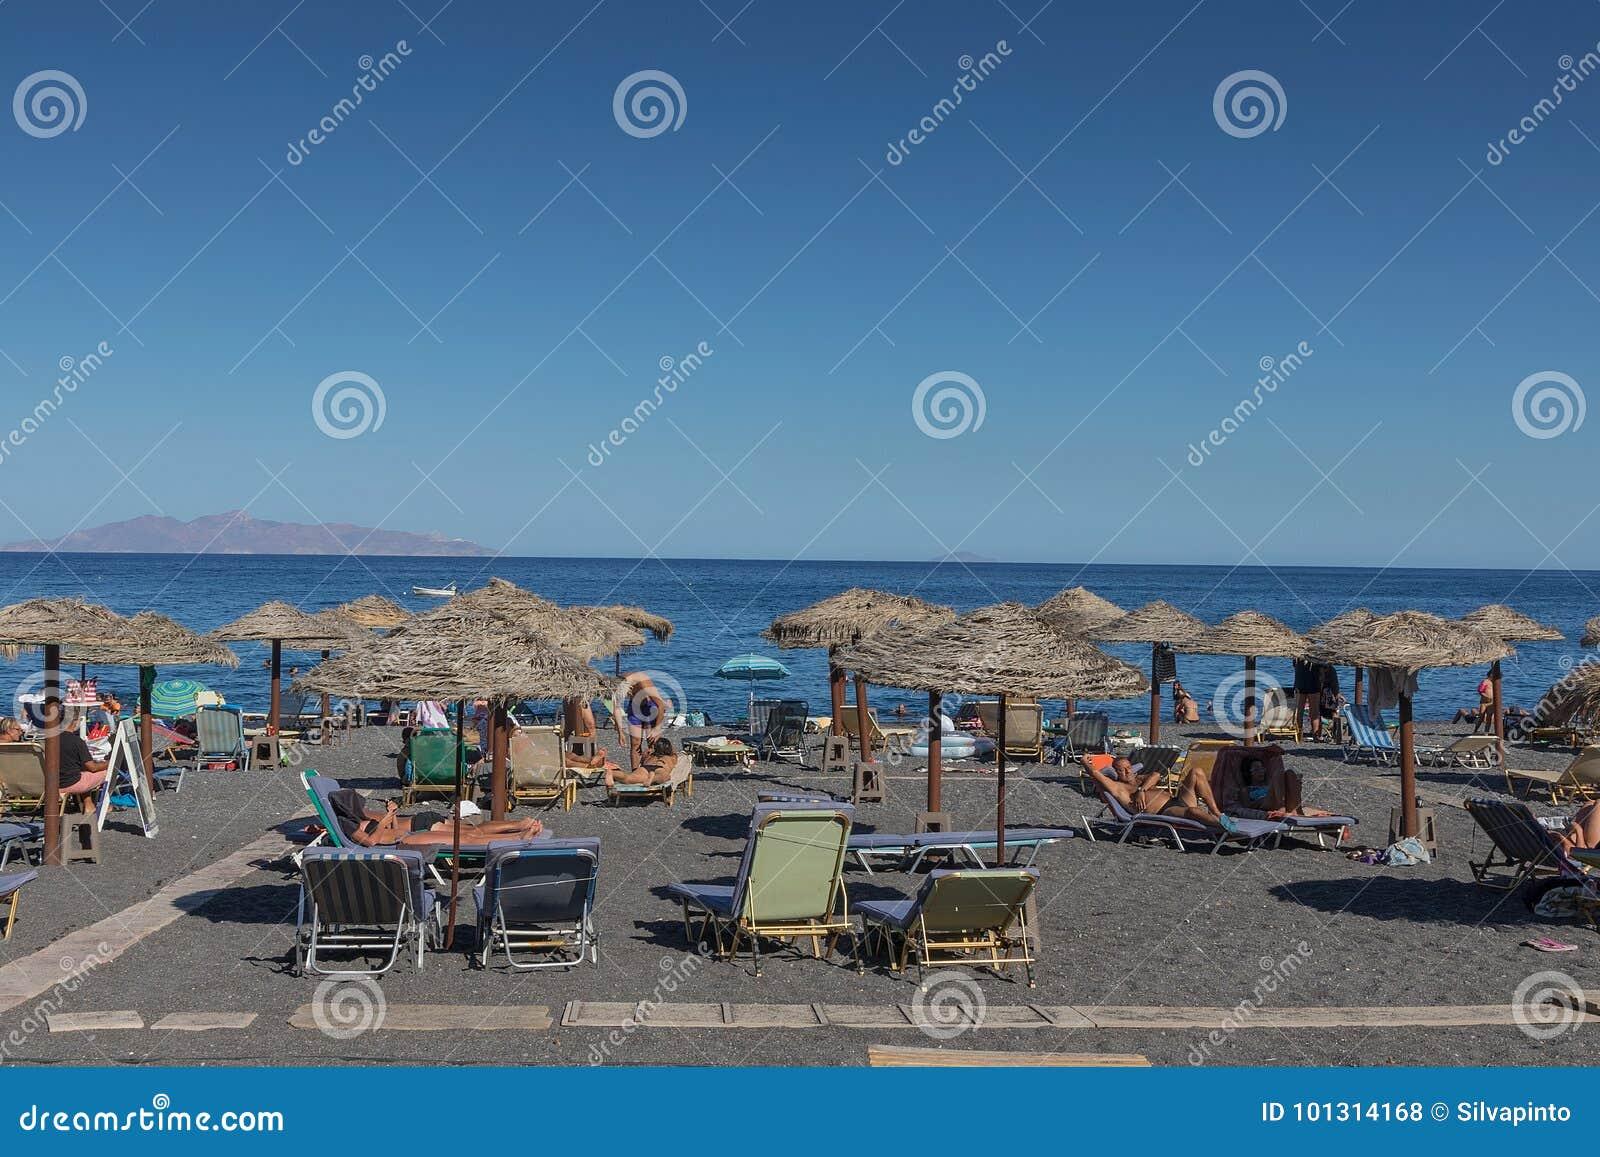 SANTORINI/GREECE o 5 de setembro - praia de Kamari em Santorini, Grécia